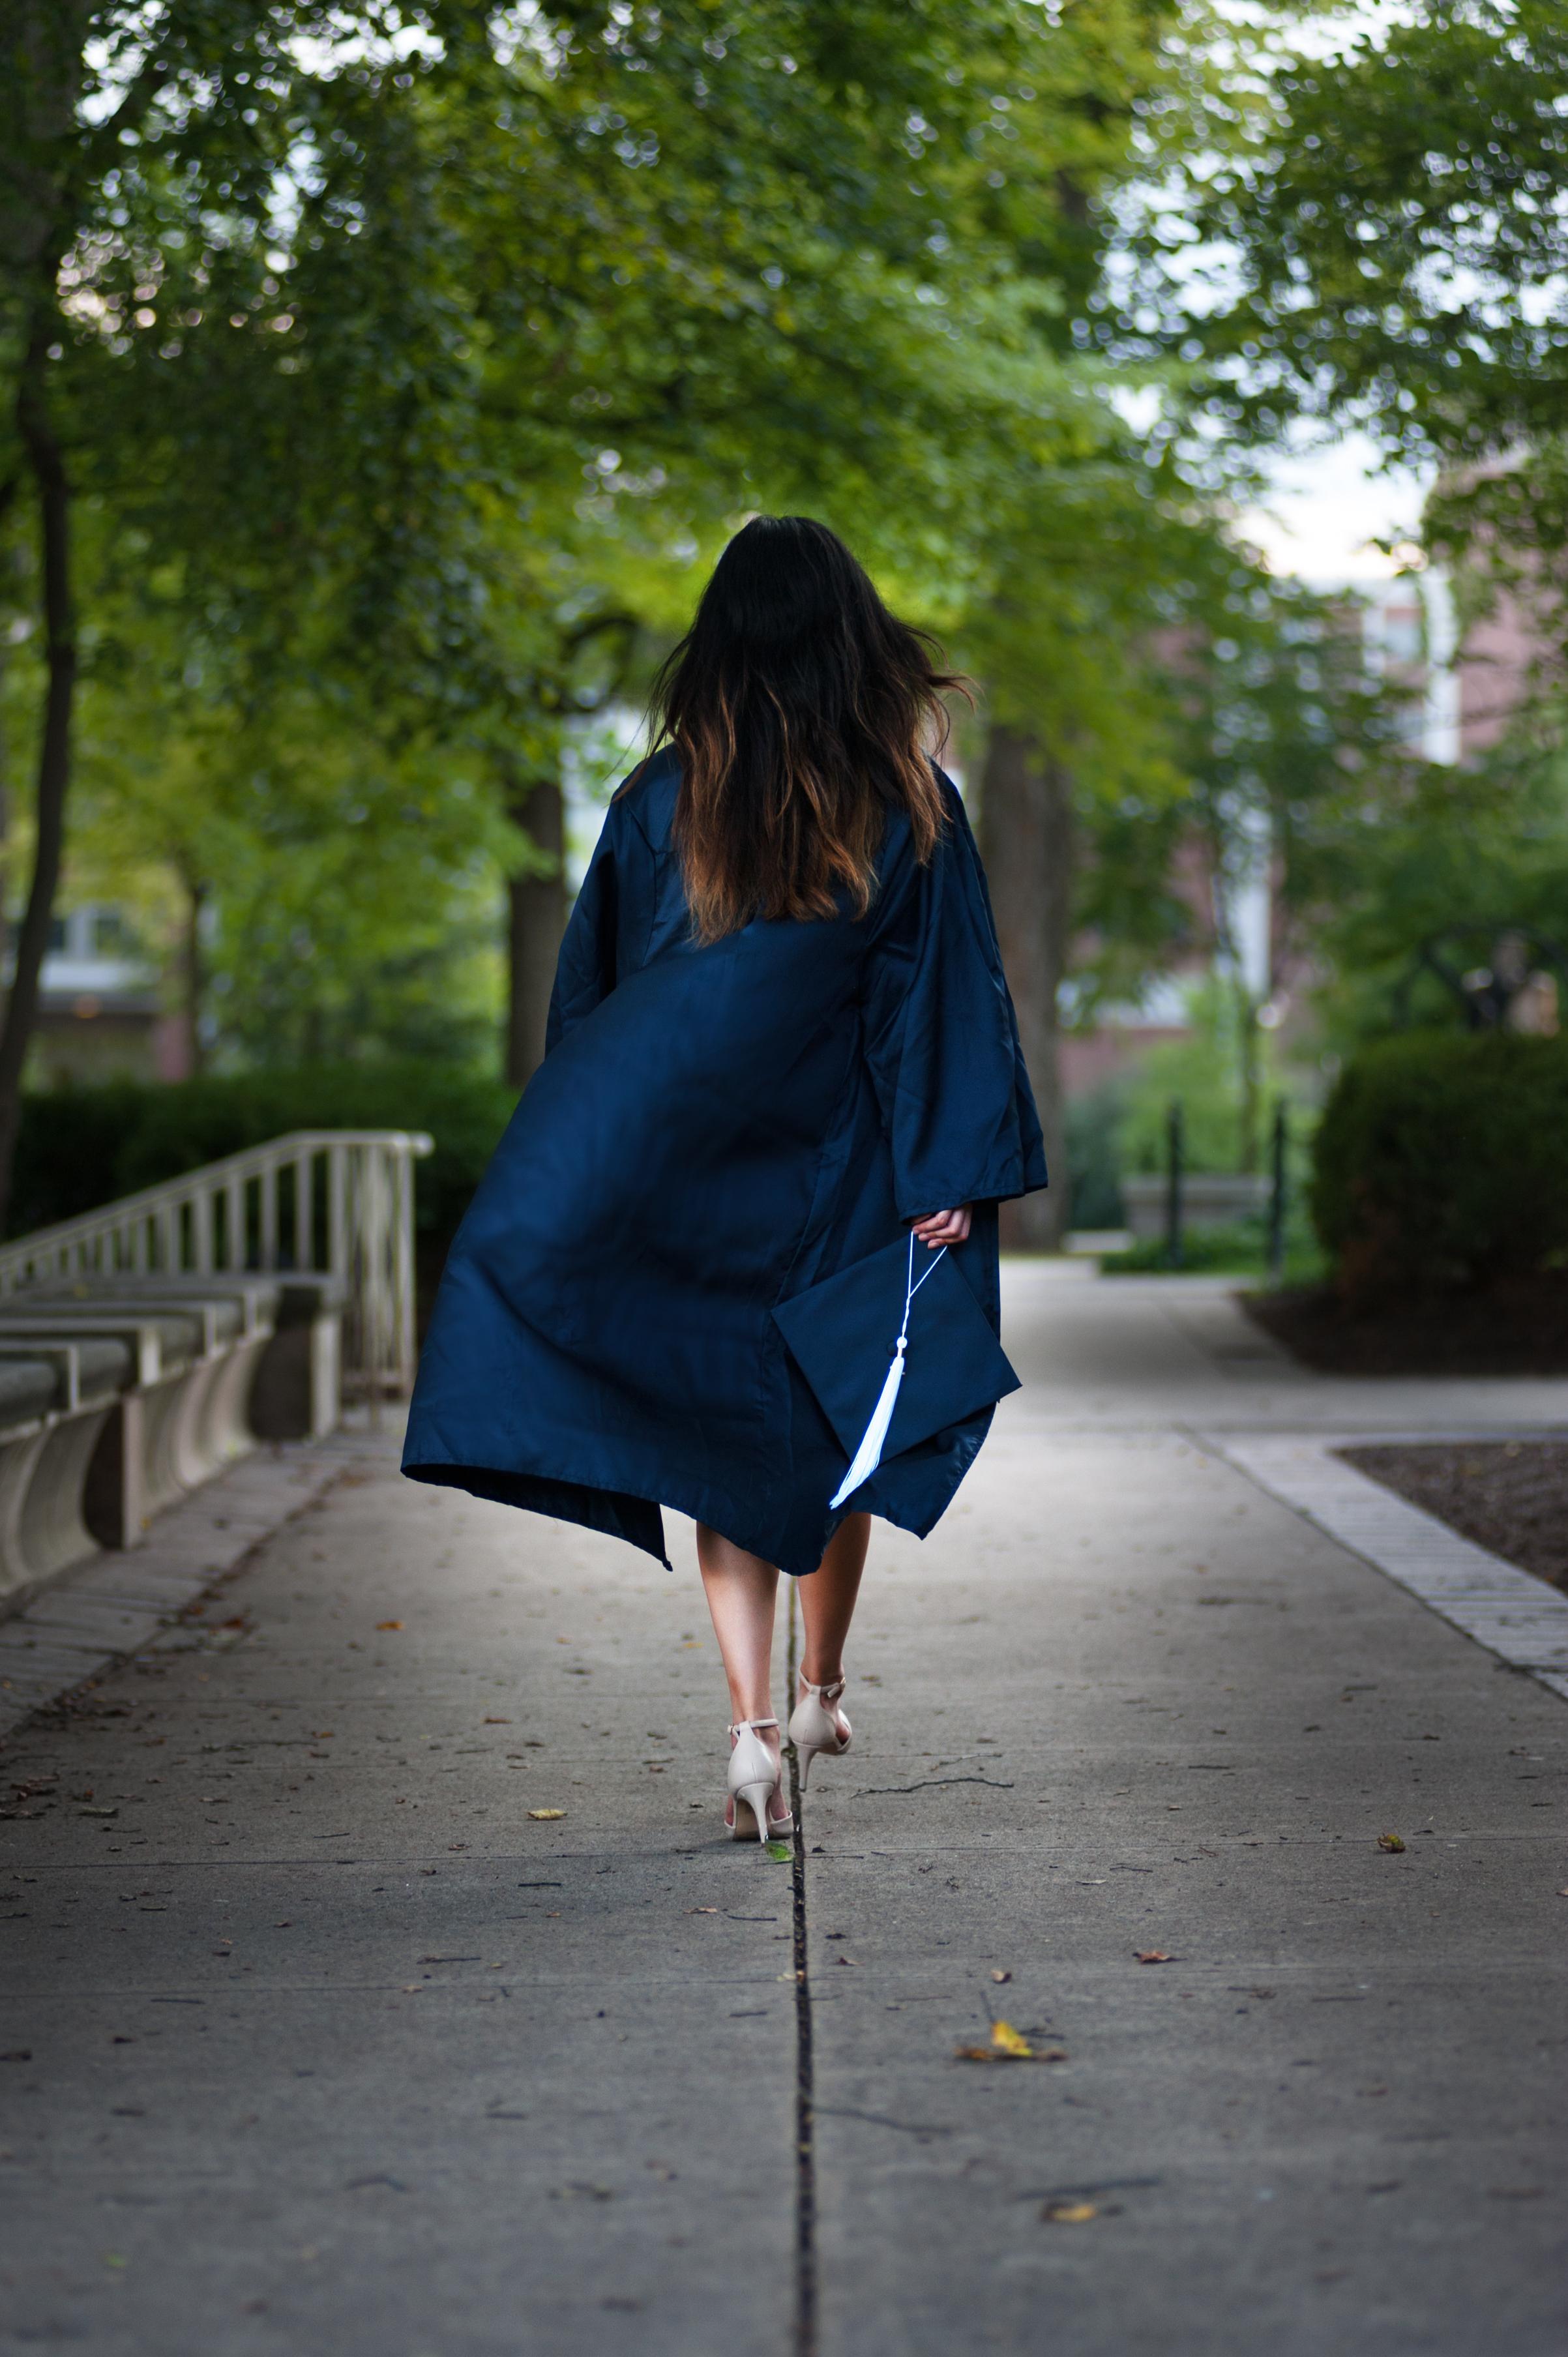 Graduation_Gwen_Woo-14.jpg